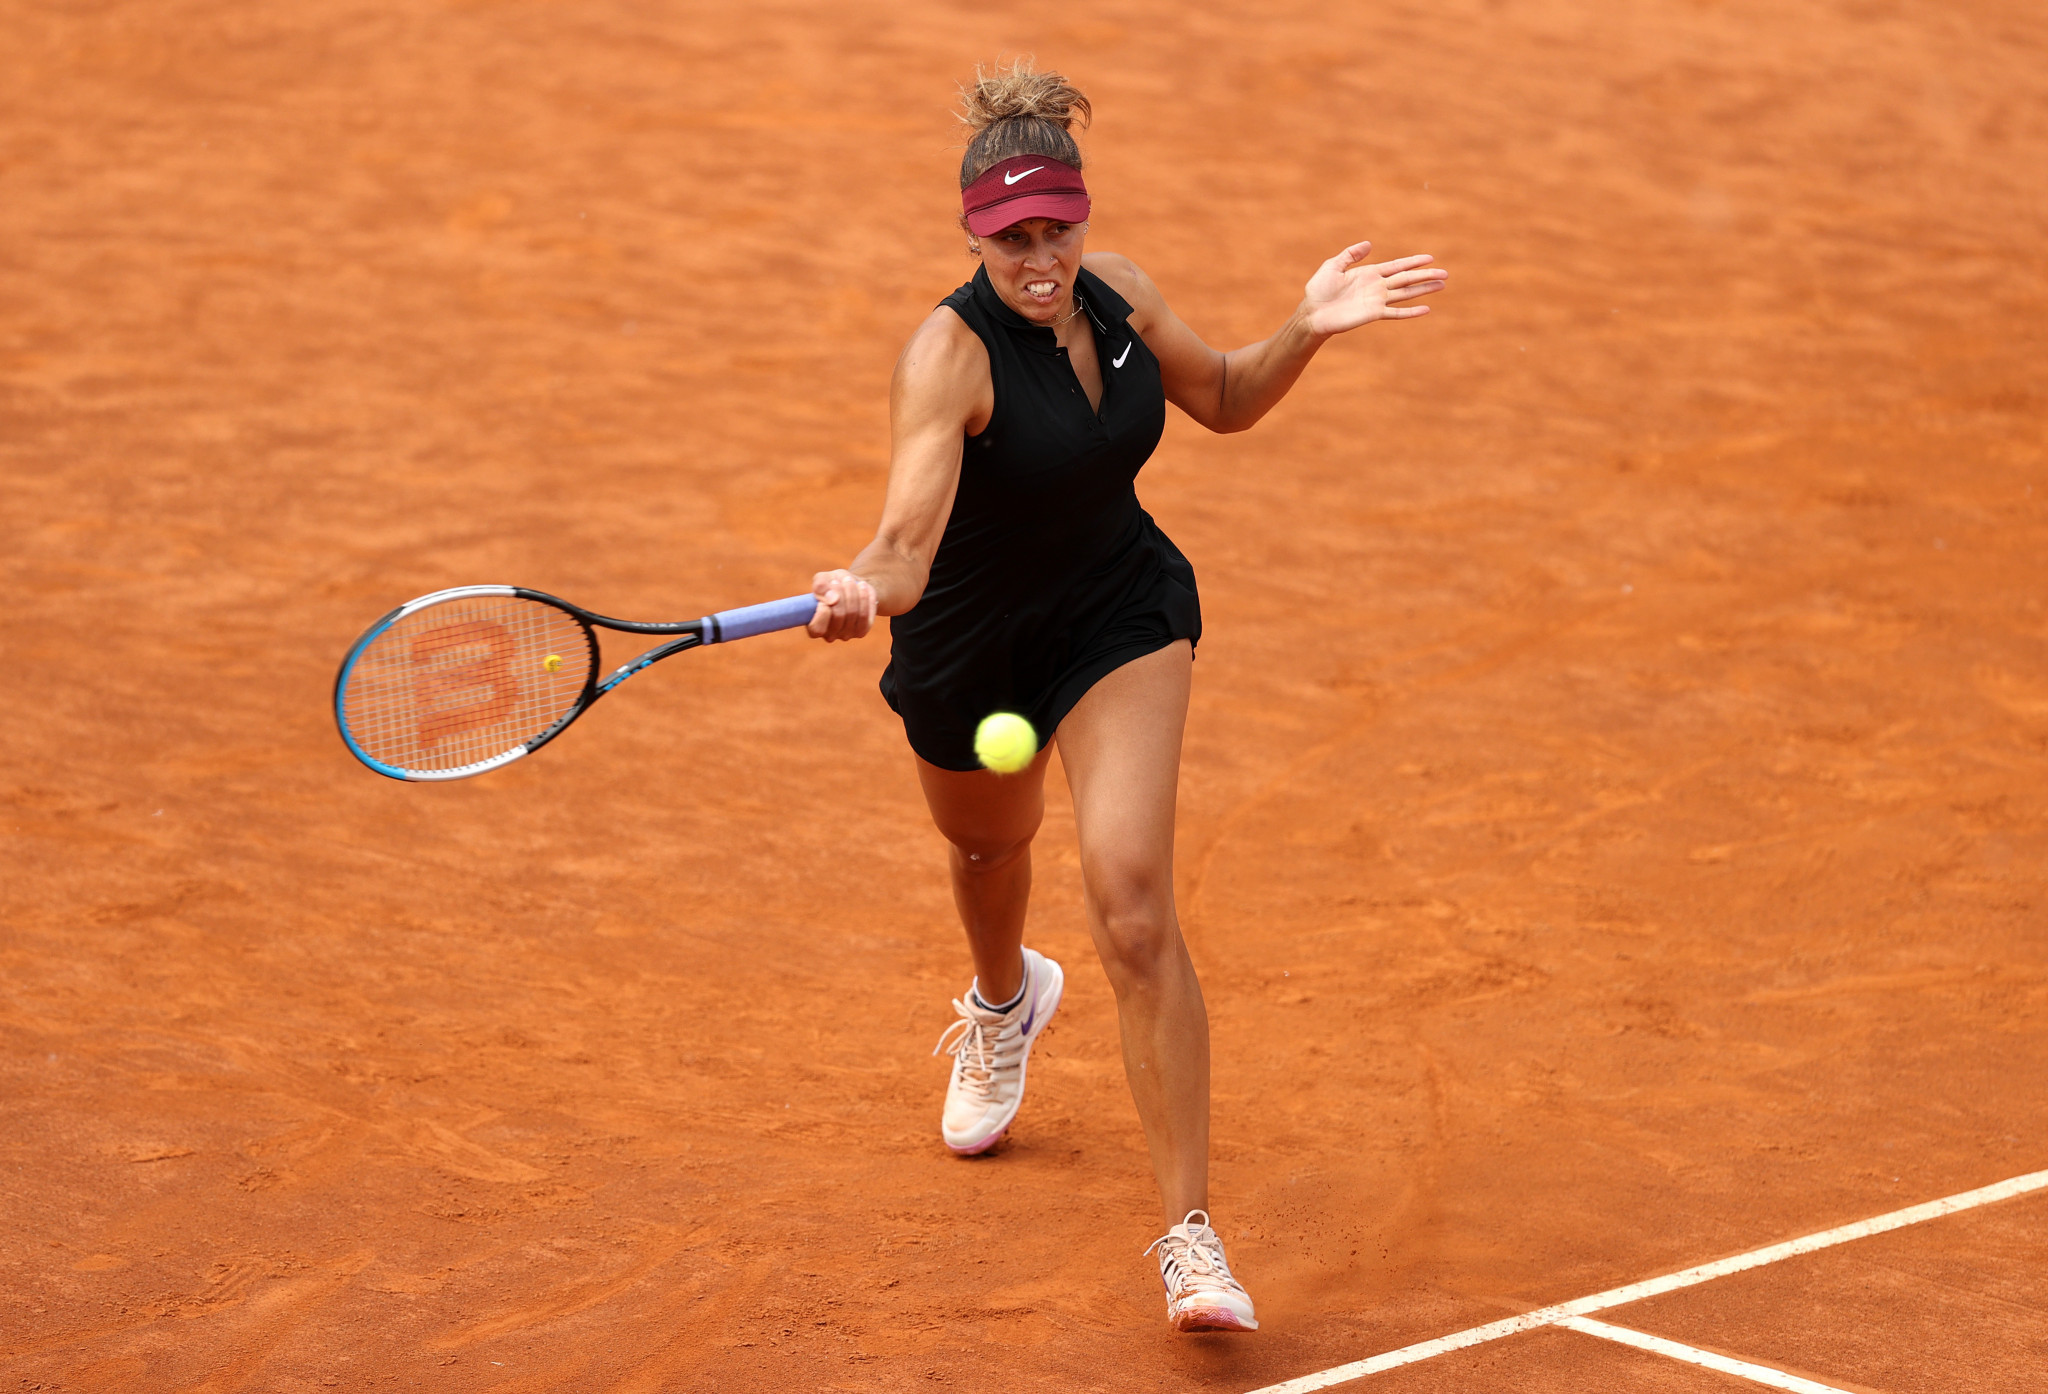 Keys edges Stephens as in-form Berrettini passes tough test at Italian Open